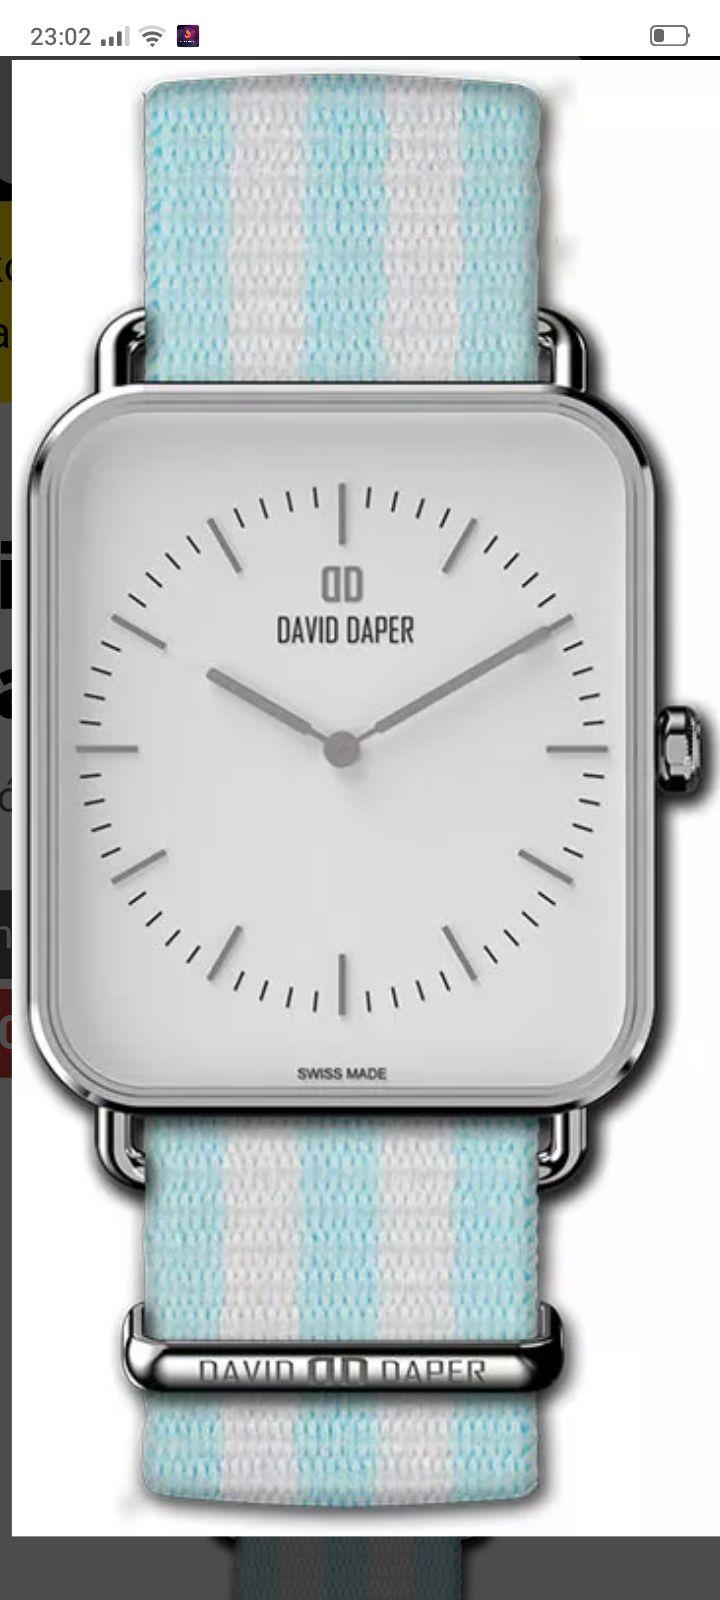 Zegarek, zegarki David daper w cenach od 180 zł.